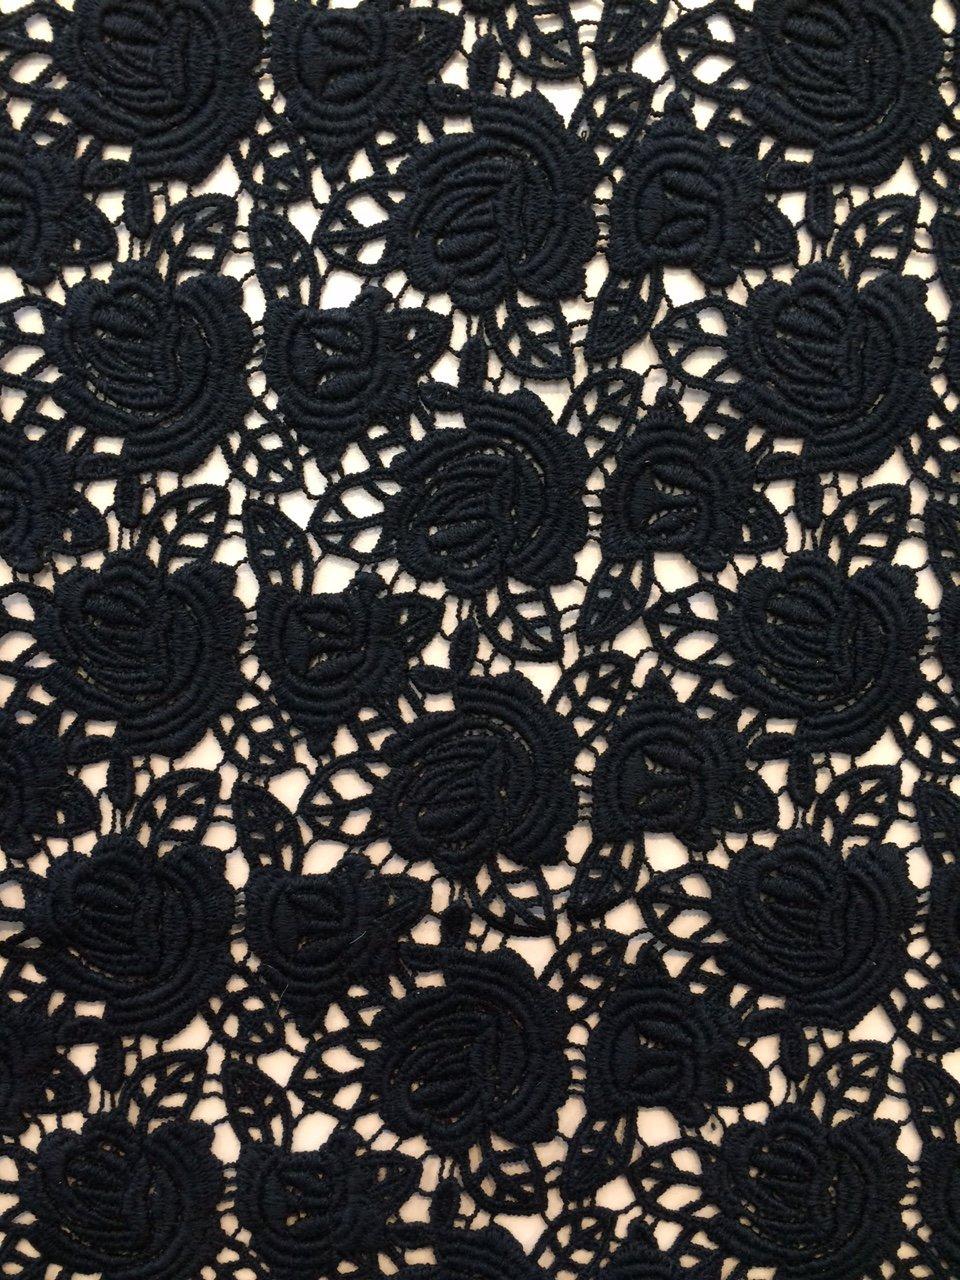 Black Roses Venetian Lace